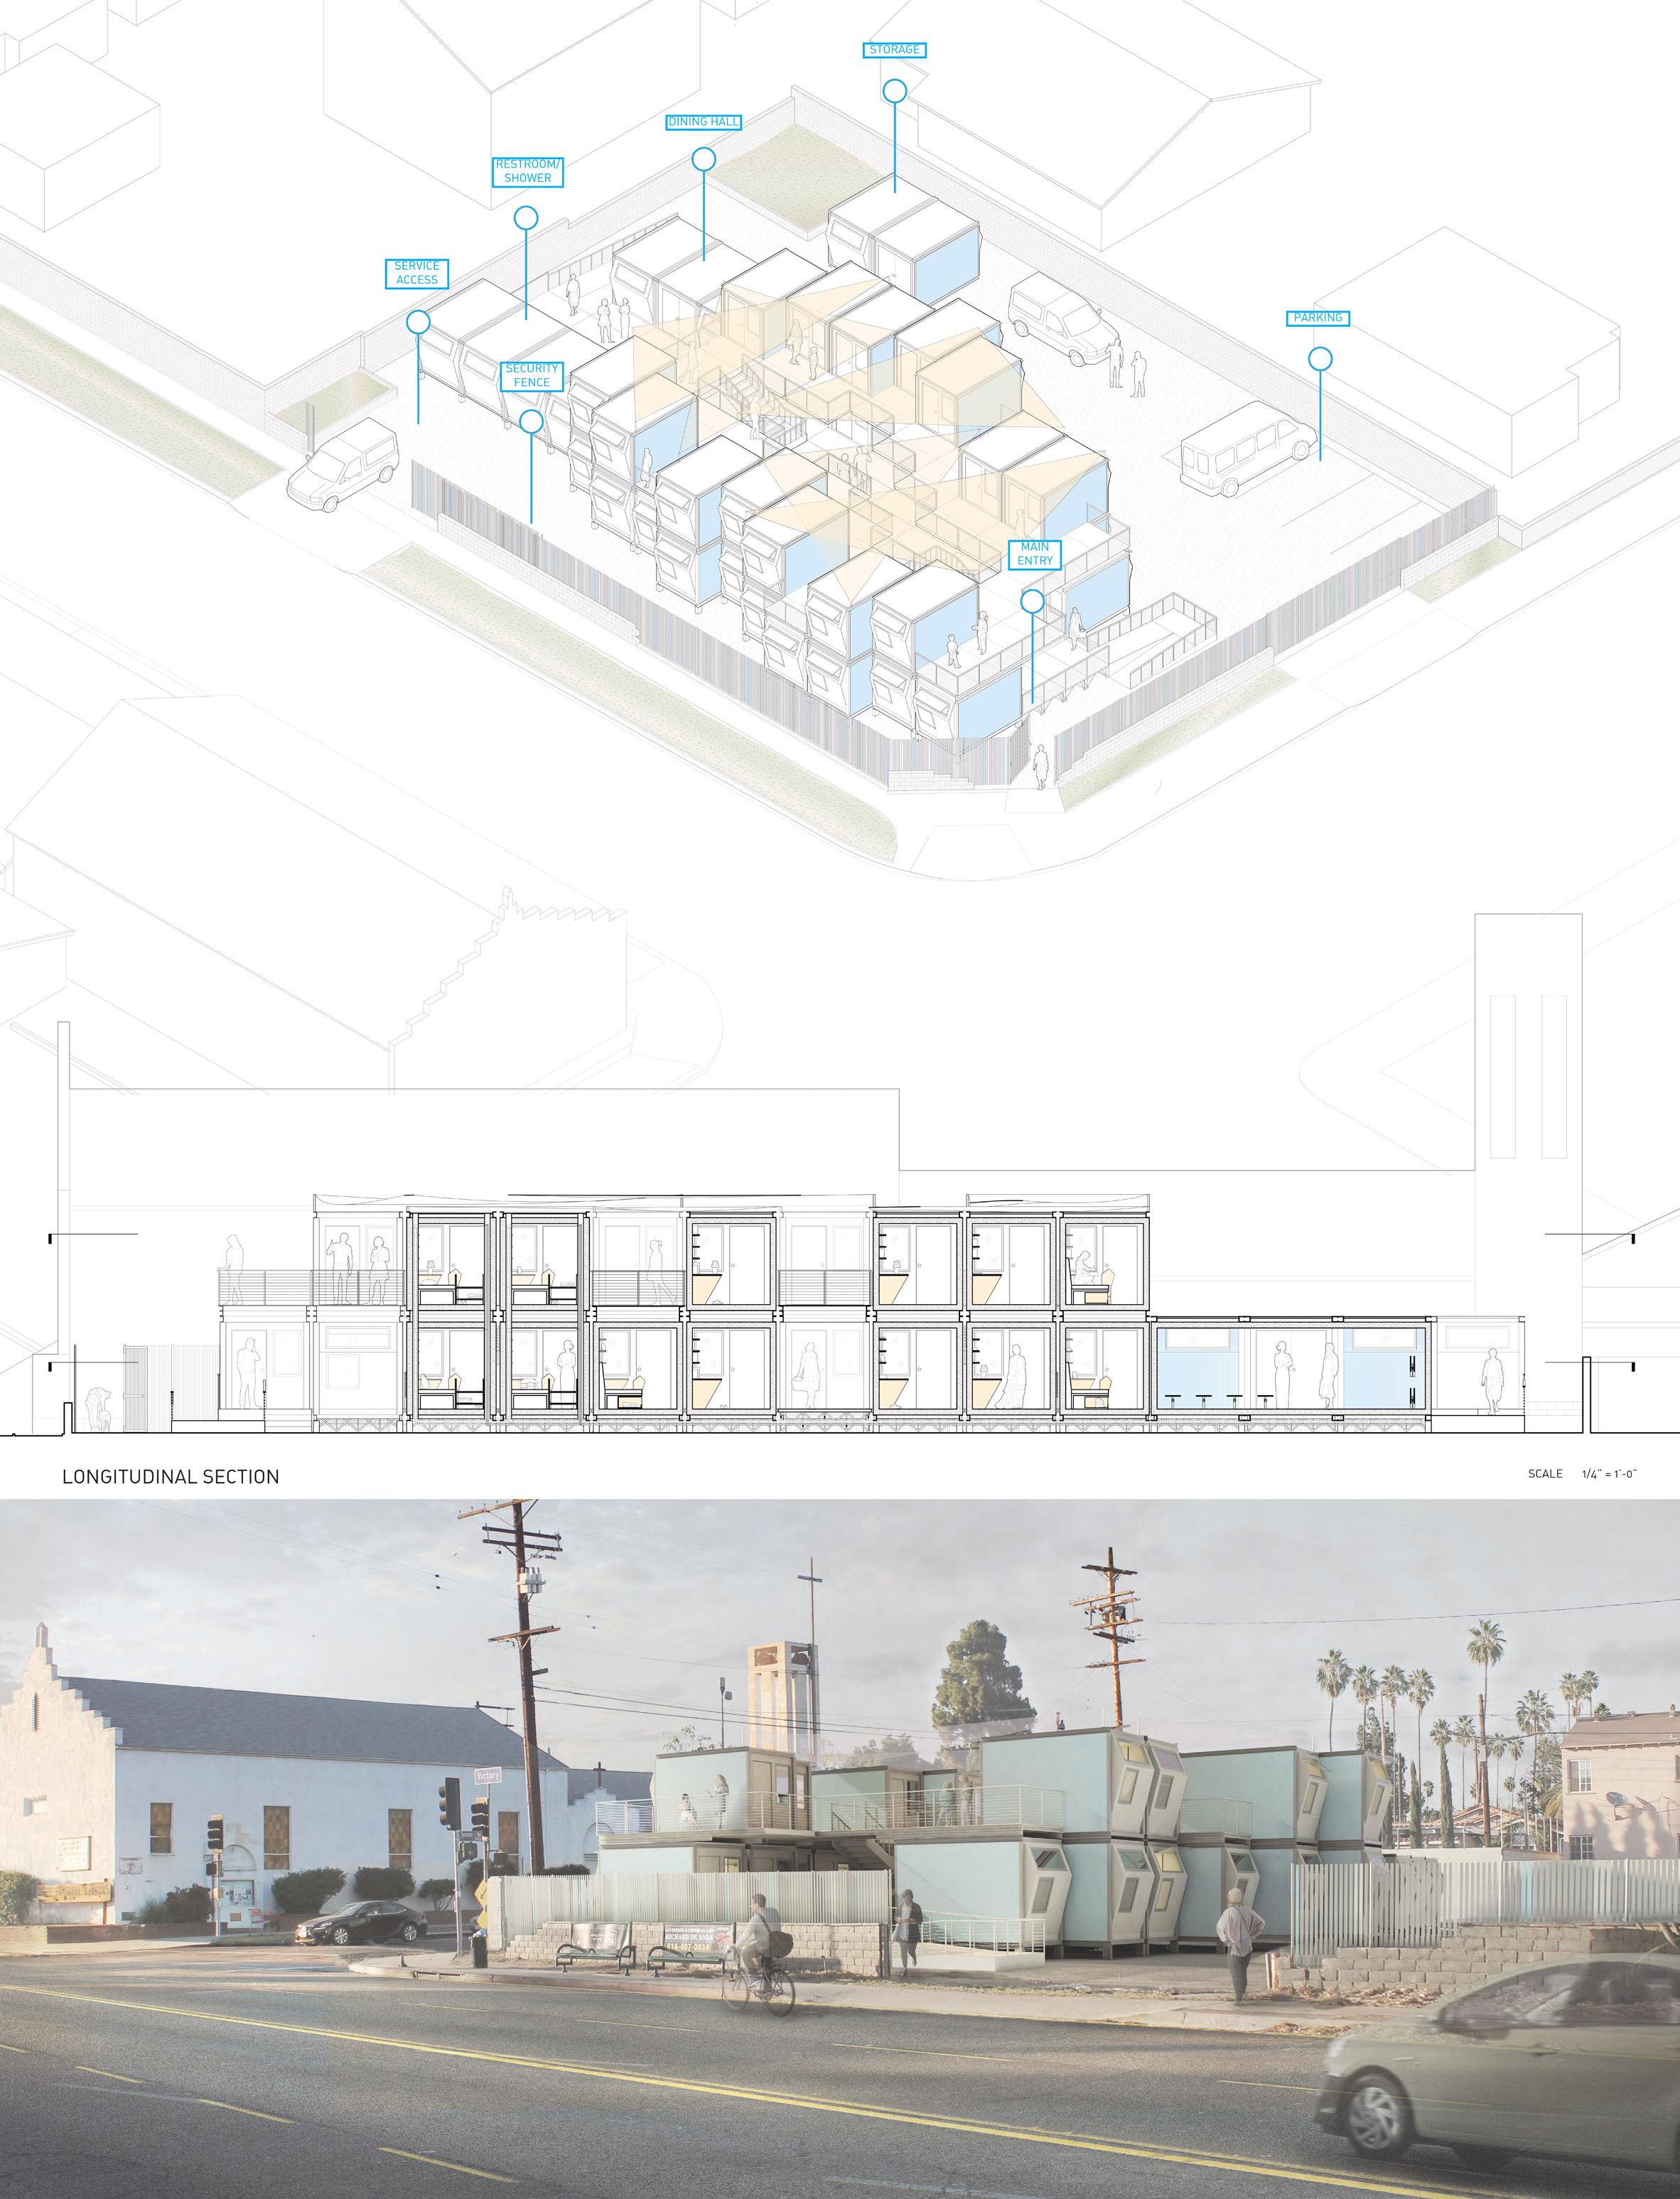 rendering-homes-for-hope-homeless-studio-project-madworkshop-_dezeen_2364_col_1.jpg